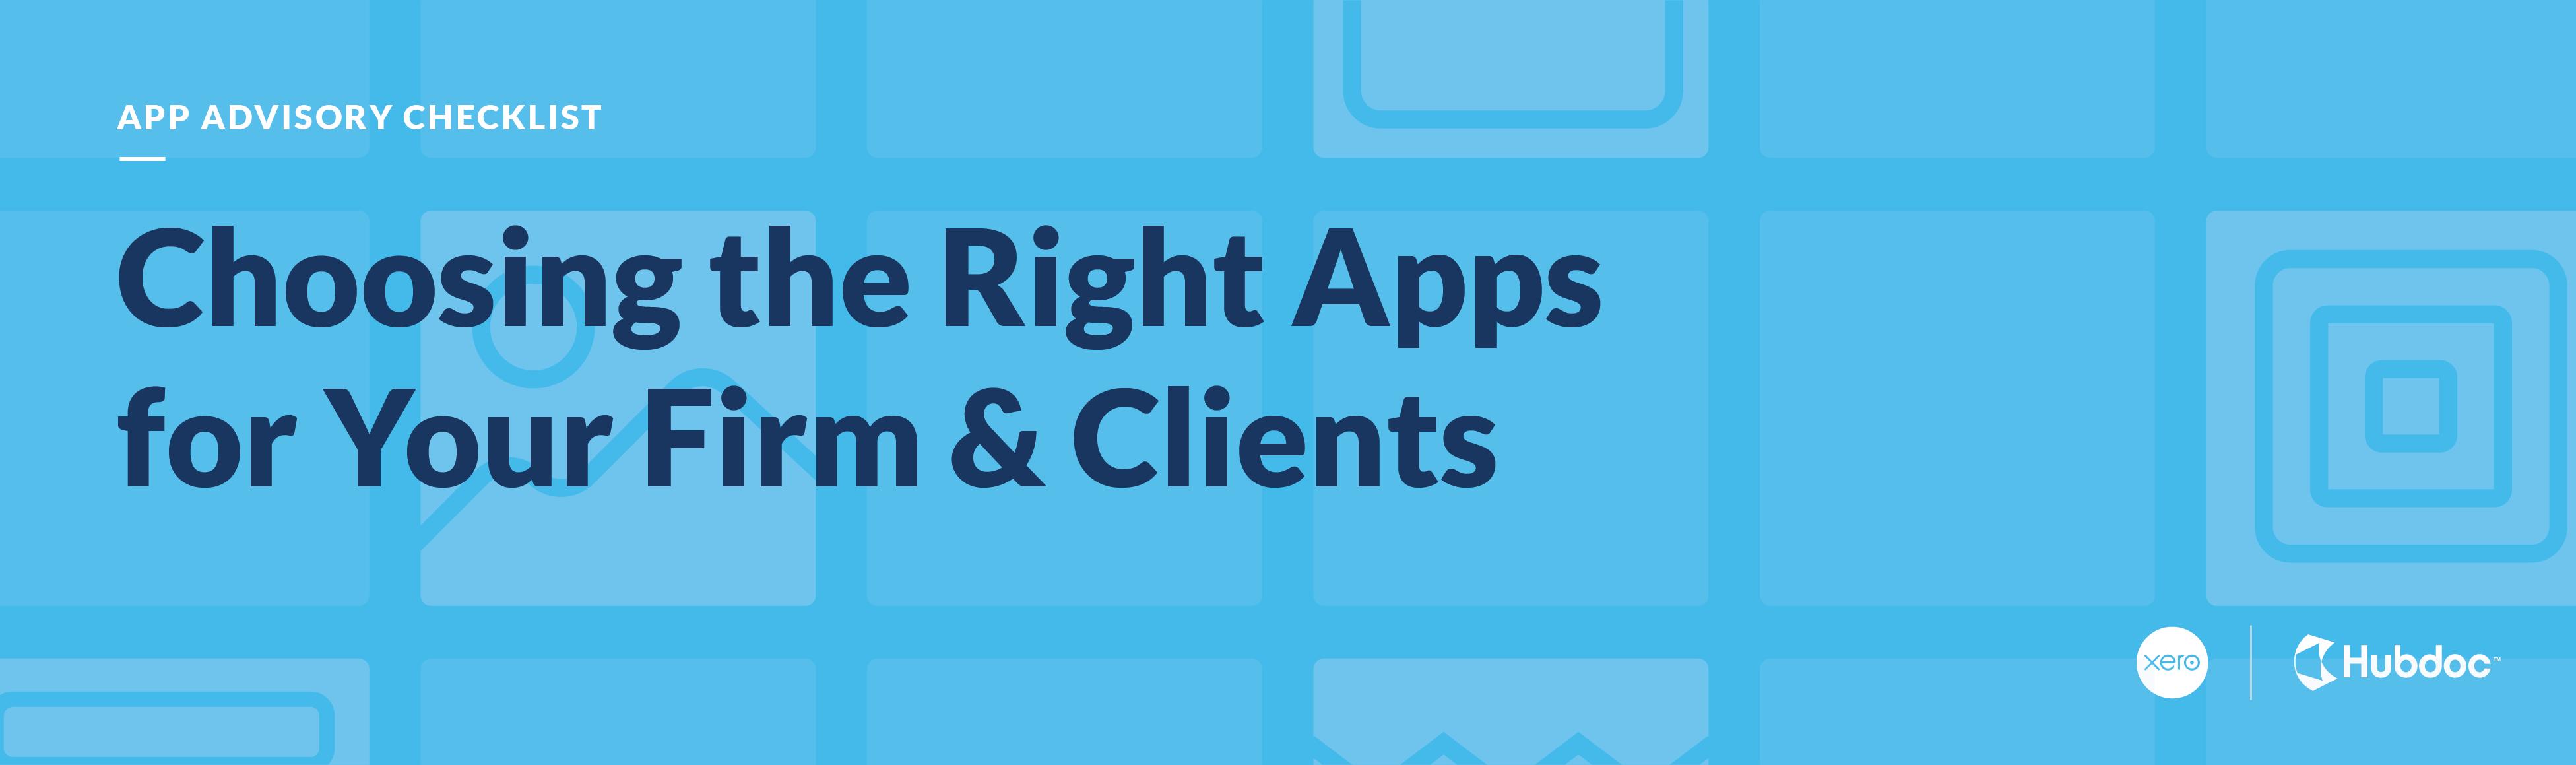 App Advisory Checklist